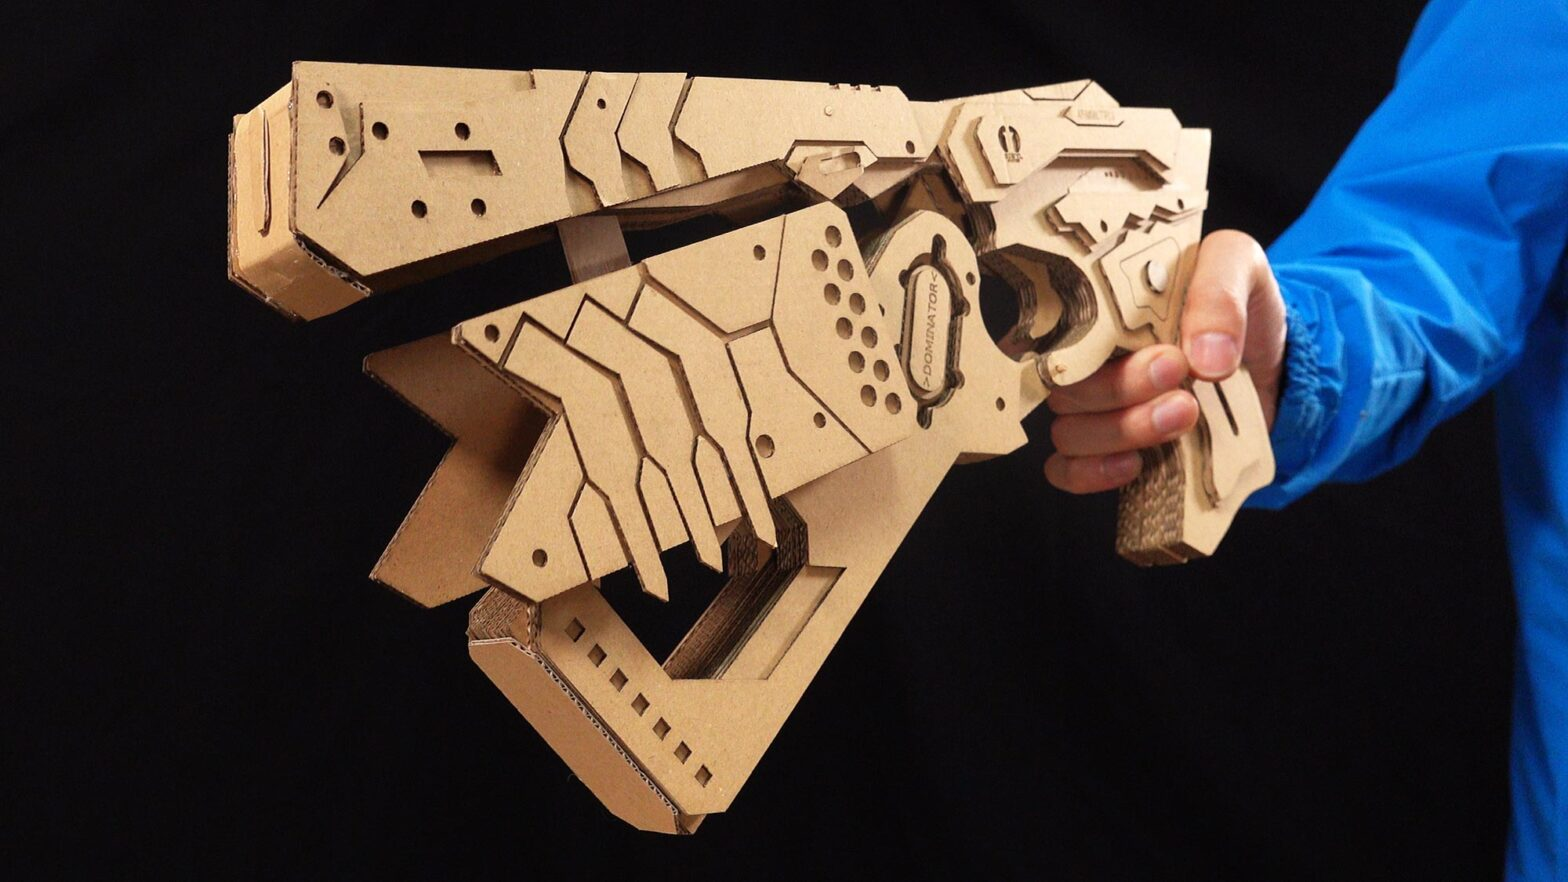 DIY Cardboard Psycho-Pass Dominator Gun